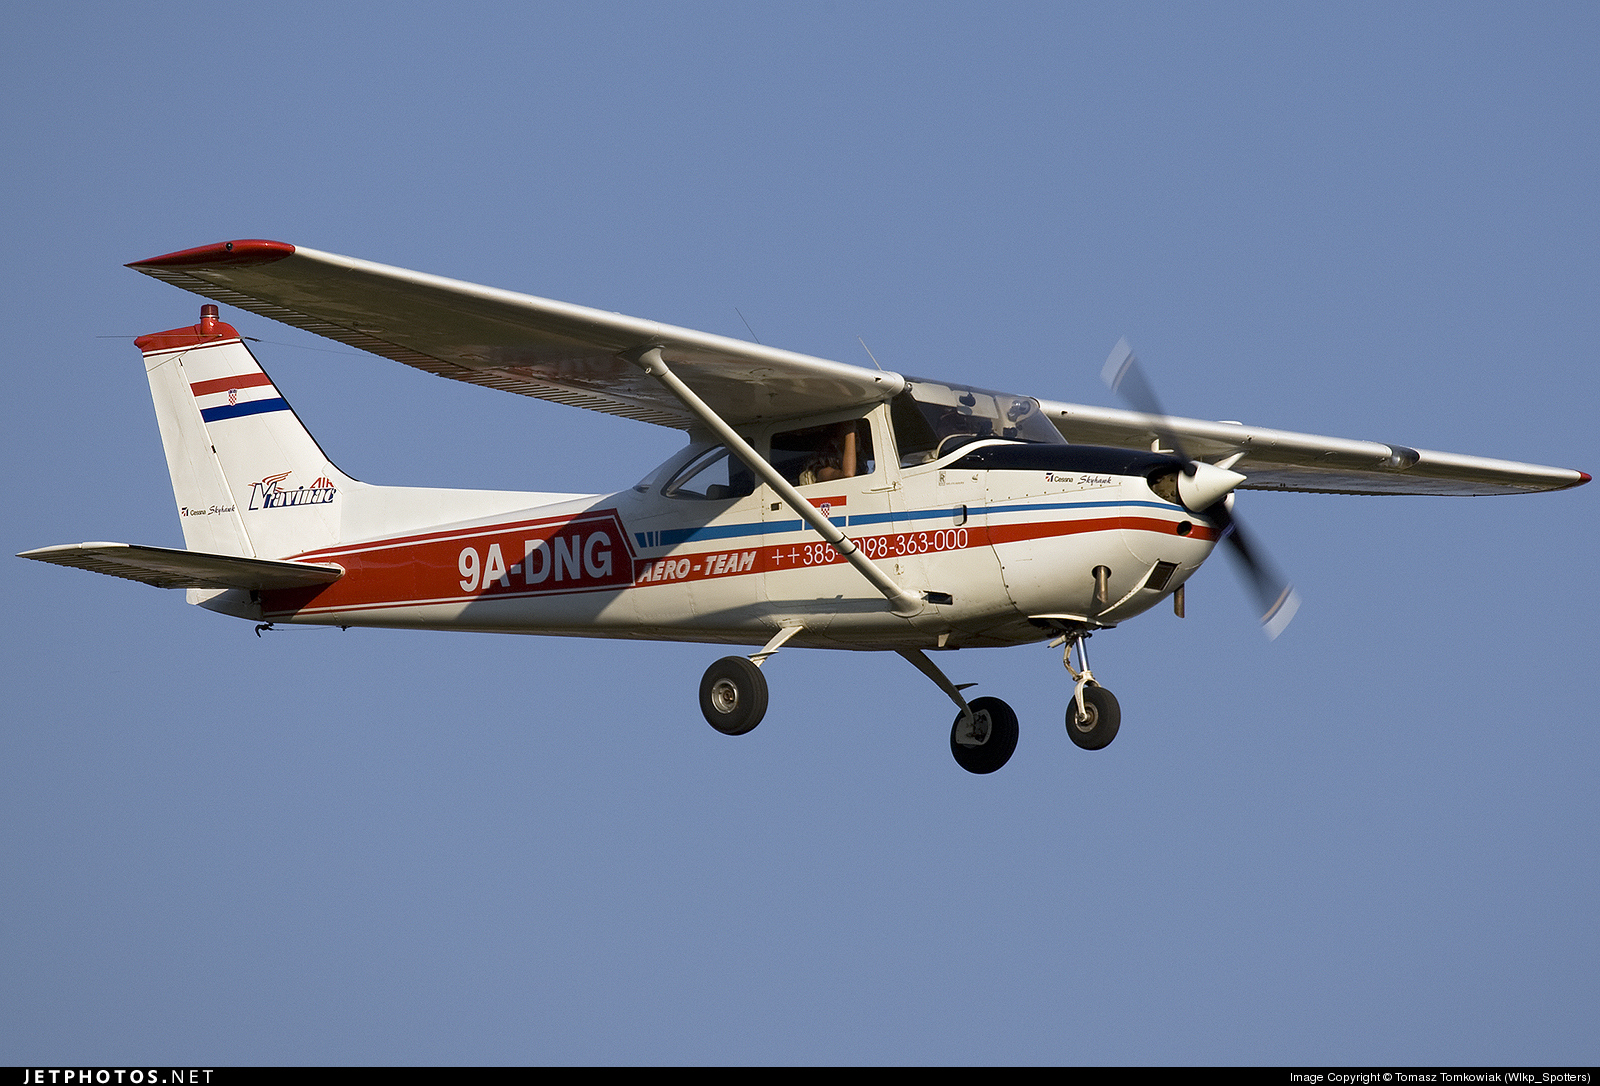 9A-DNG - Reims-Cessna F172F Skyhawk - Private